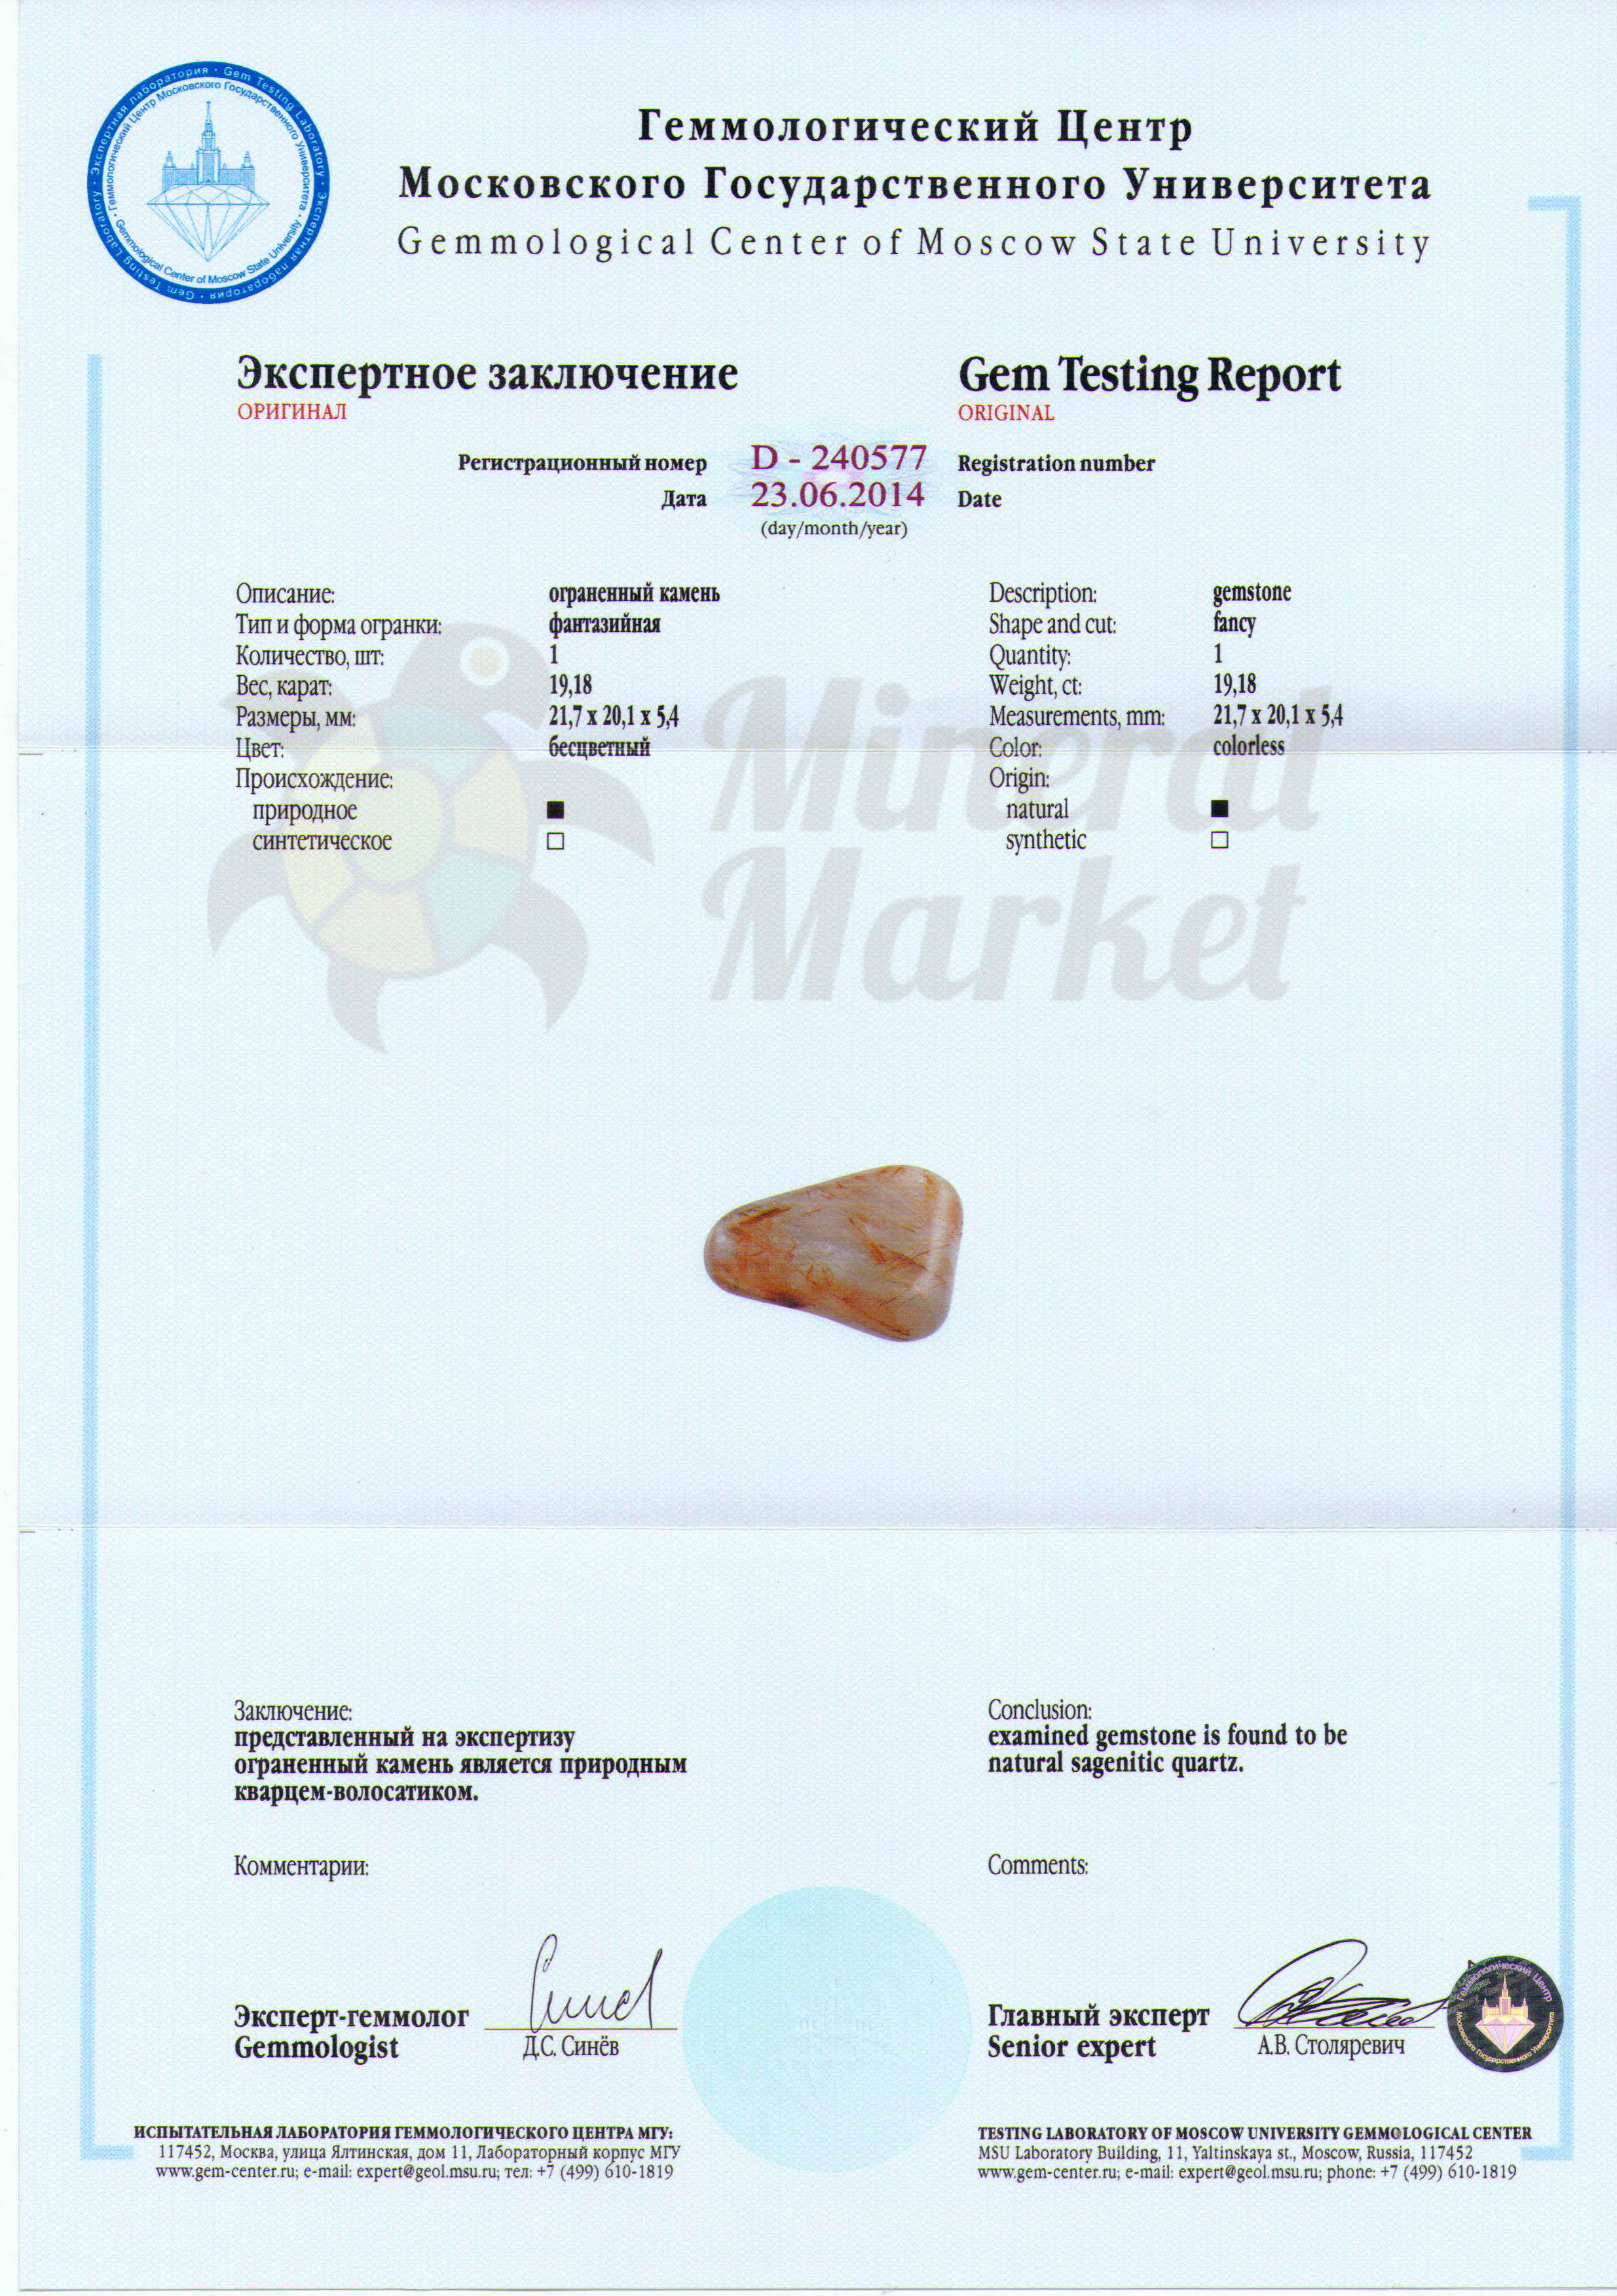 http://mineralmarket.ru/img/certificate/100.jpg